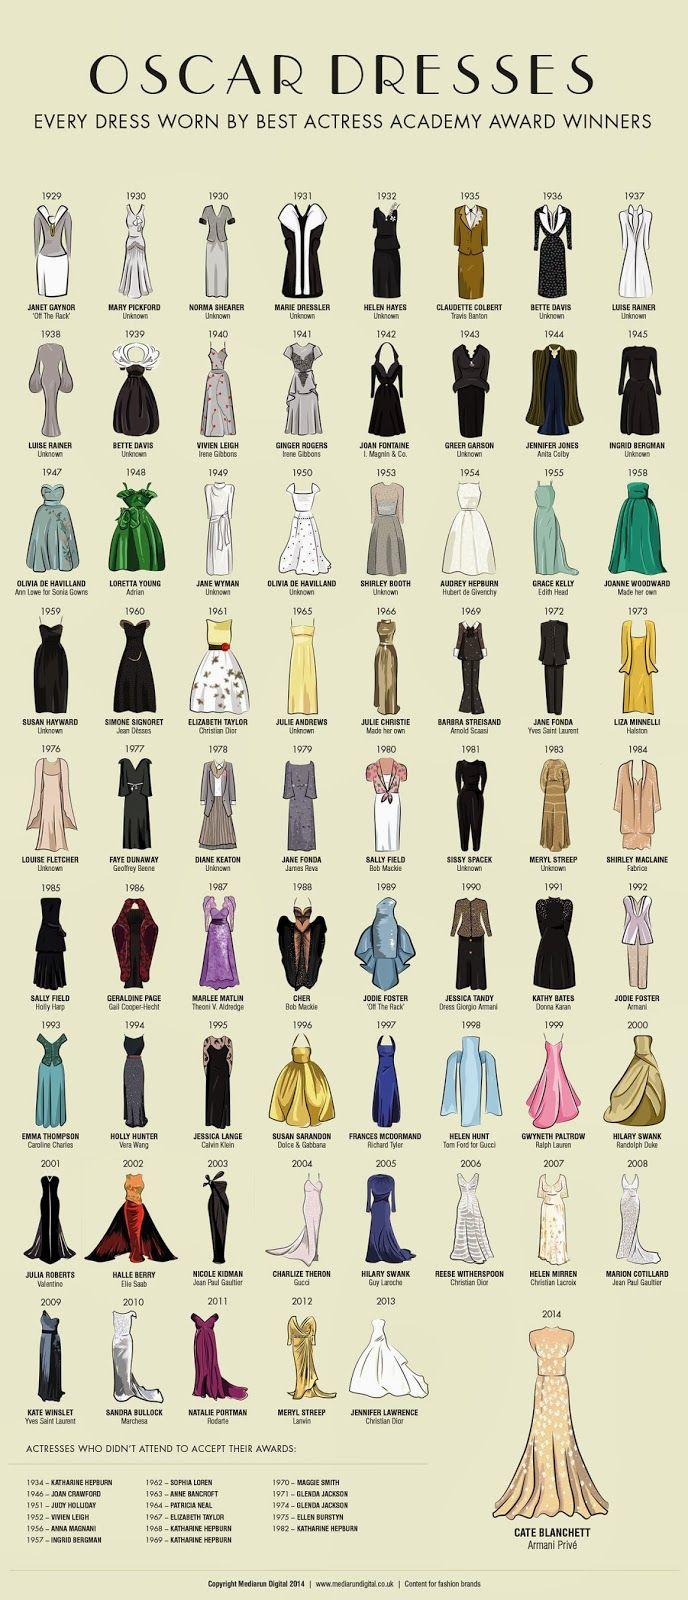 Os Vestidos das Ganhadoras do Oscar - Infográfico   Cores do Dia: Os Vestidos das Ganhadoras do Oscar - Infográfico